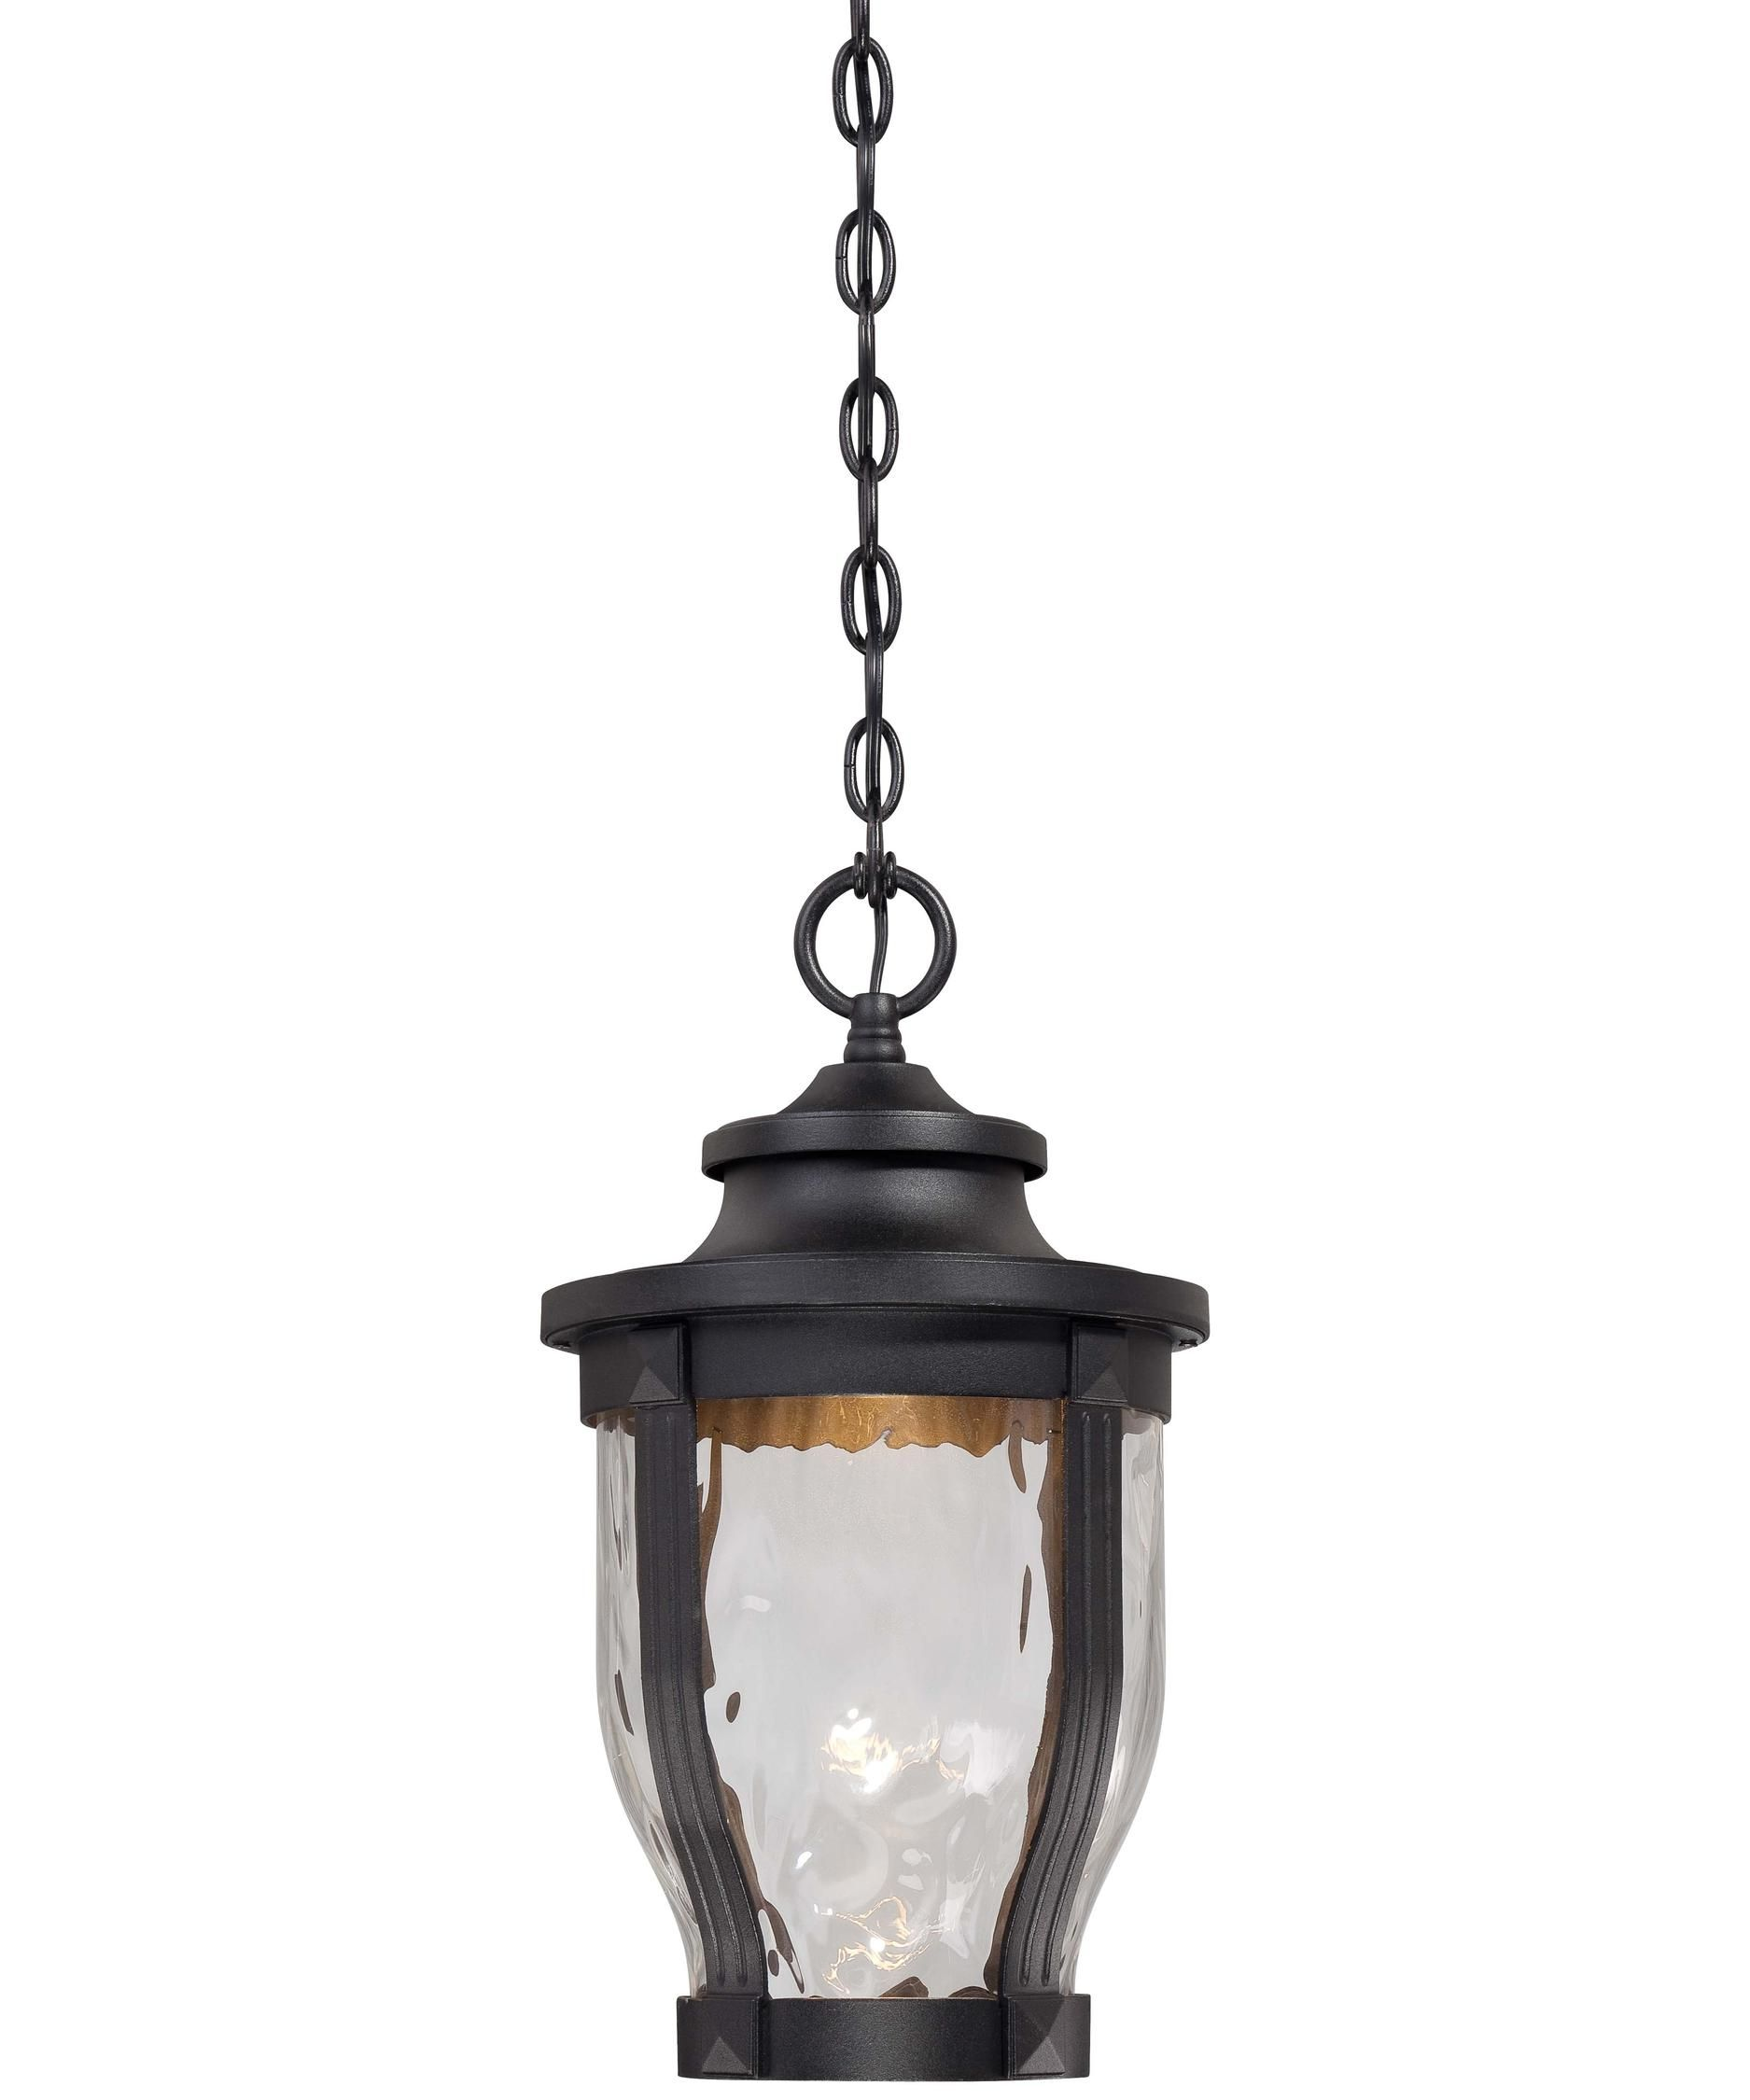 Minka Lavery 8764l Merrimack Energy Smart 1 Light Outdoor Hanging Lantern Capitol Lighting